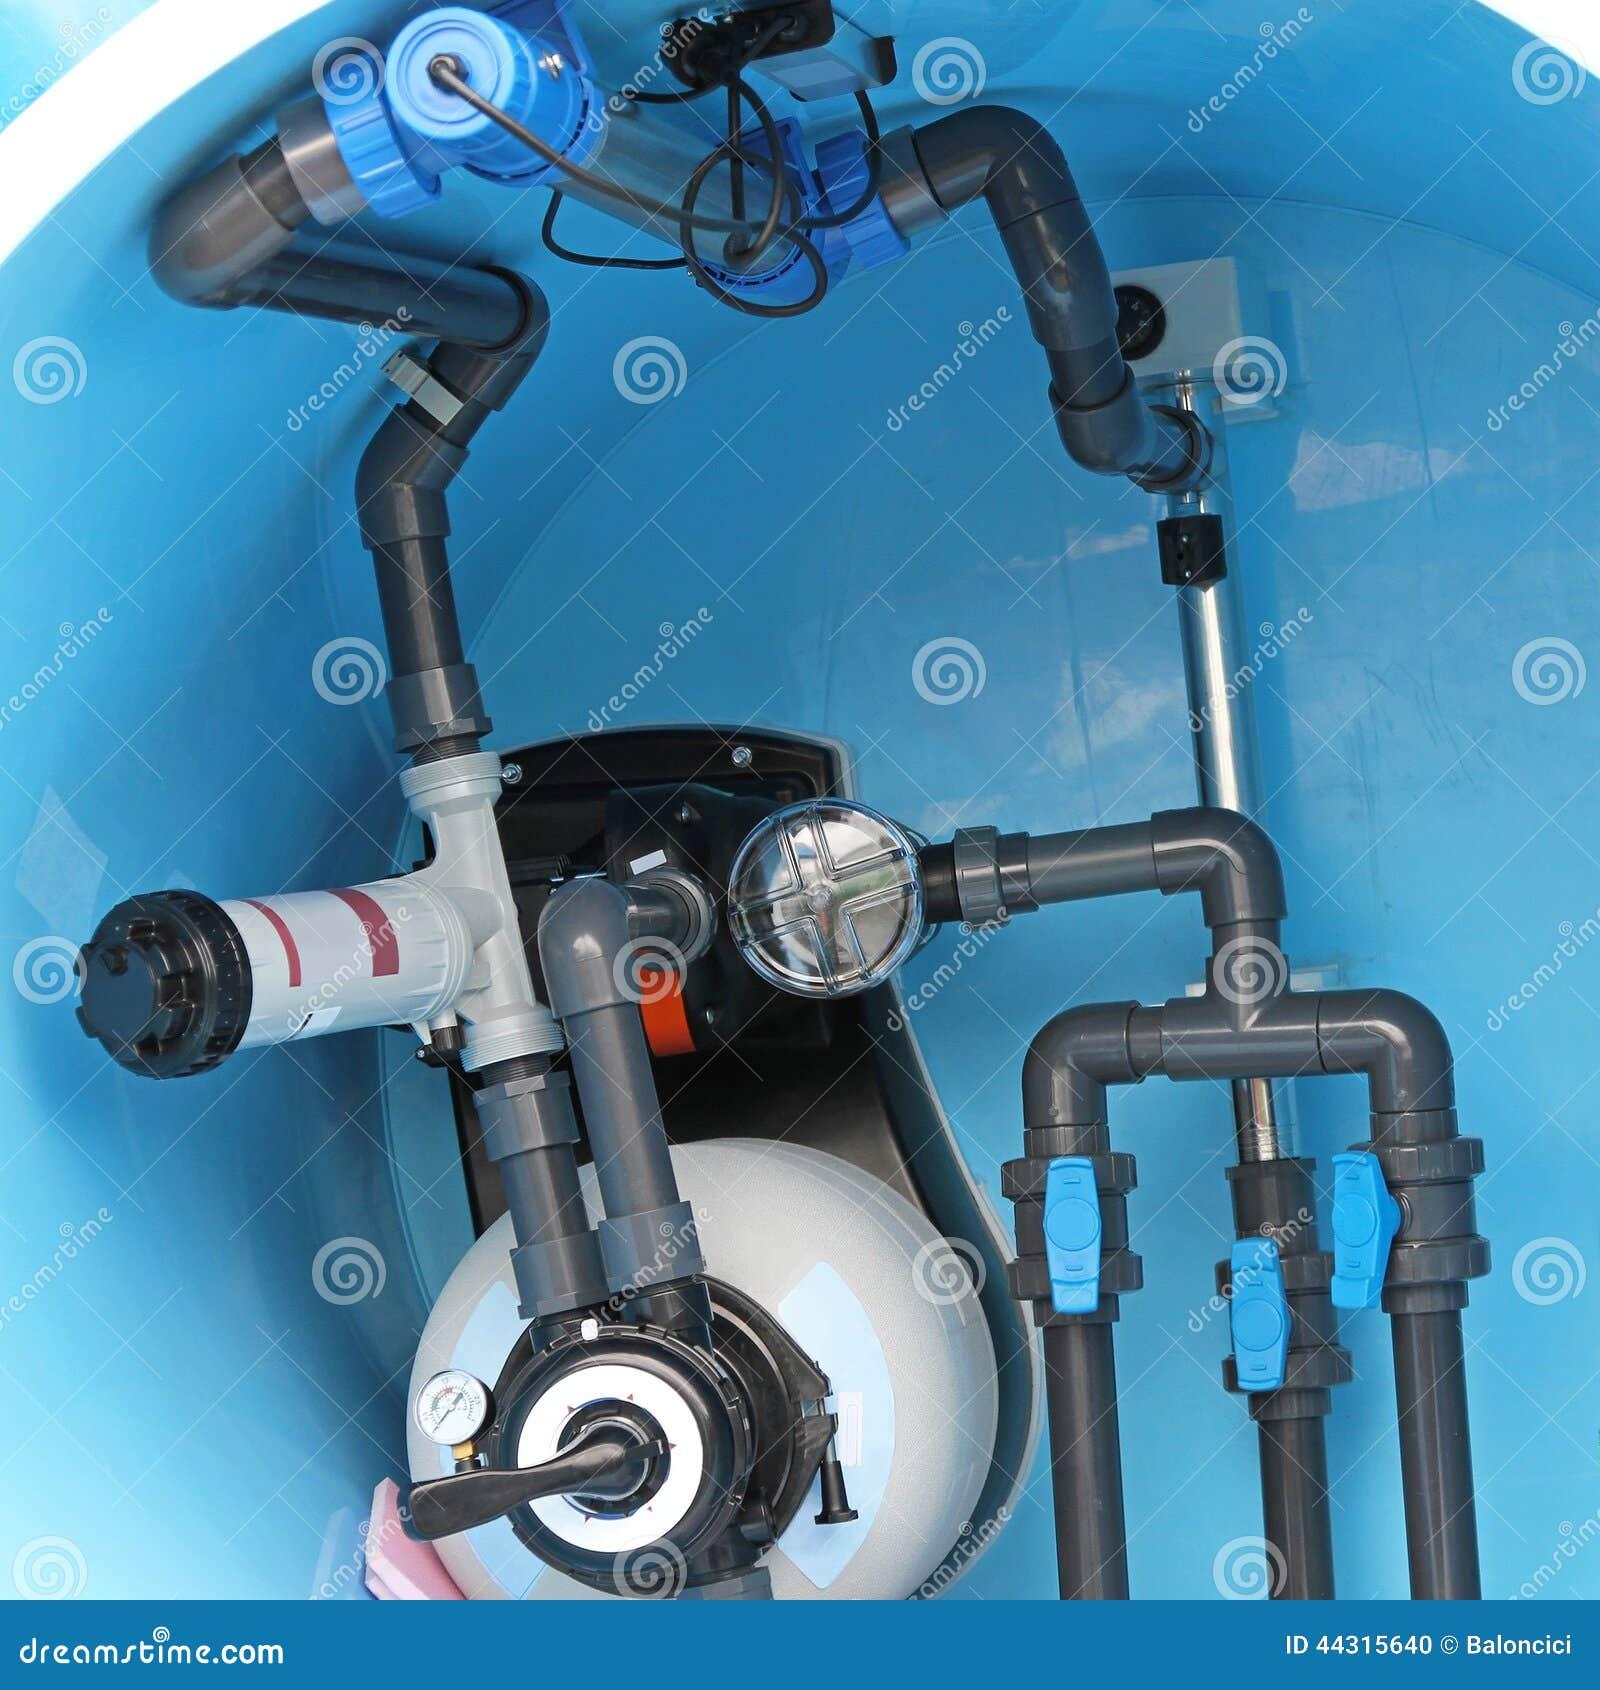 Swimming Pool Plumbing Fittings : Swimming pool plumbing stock photo image